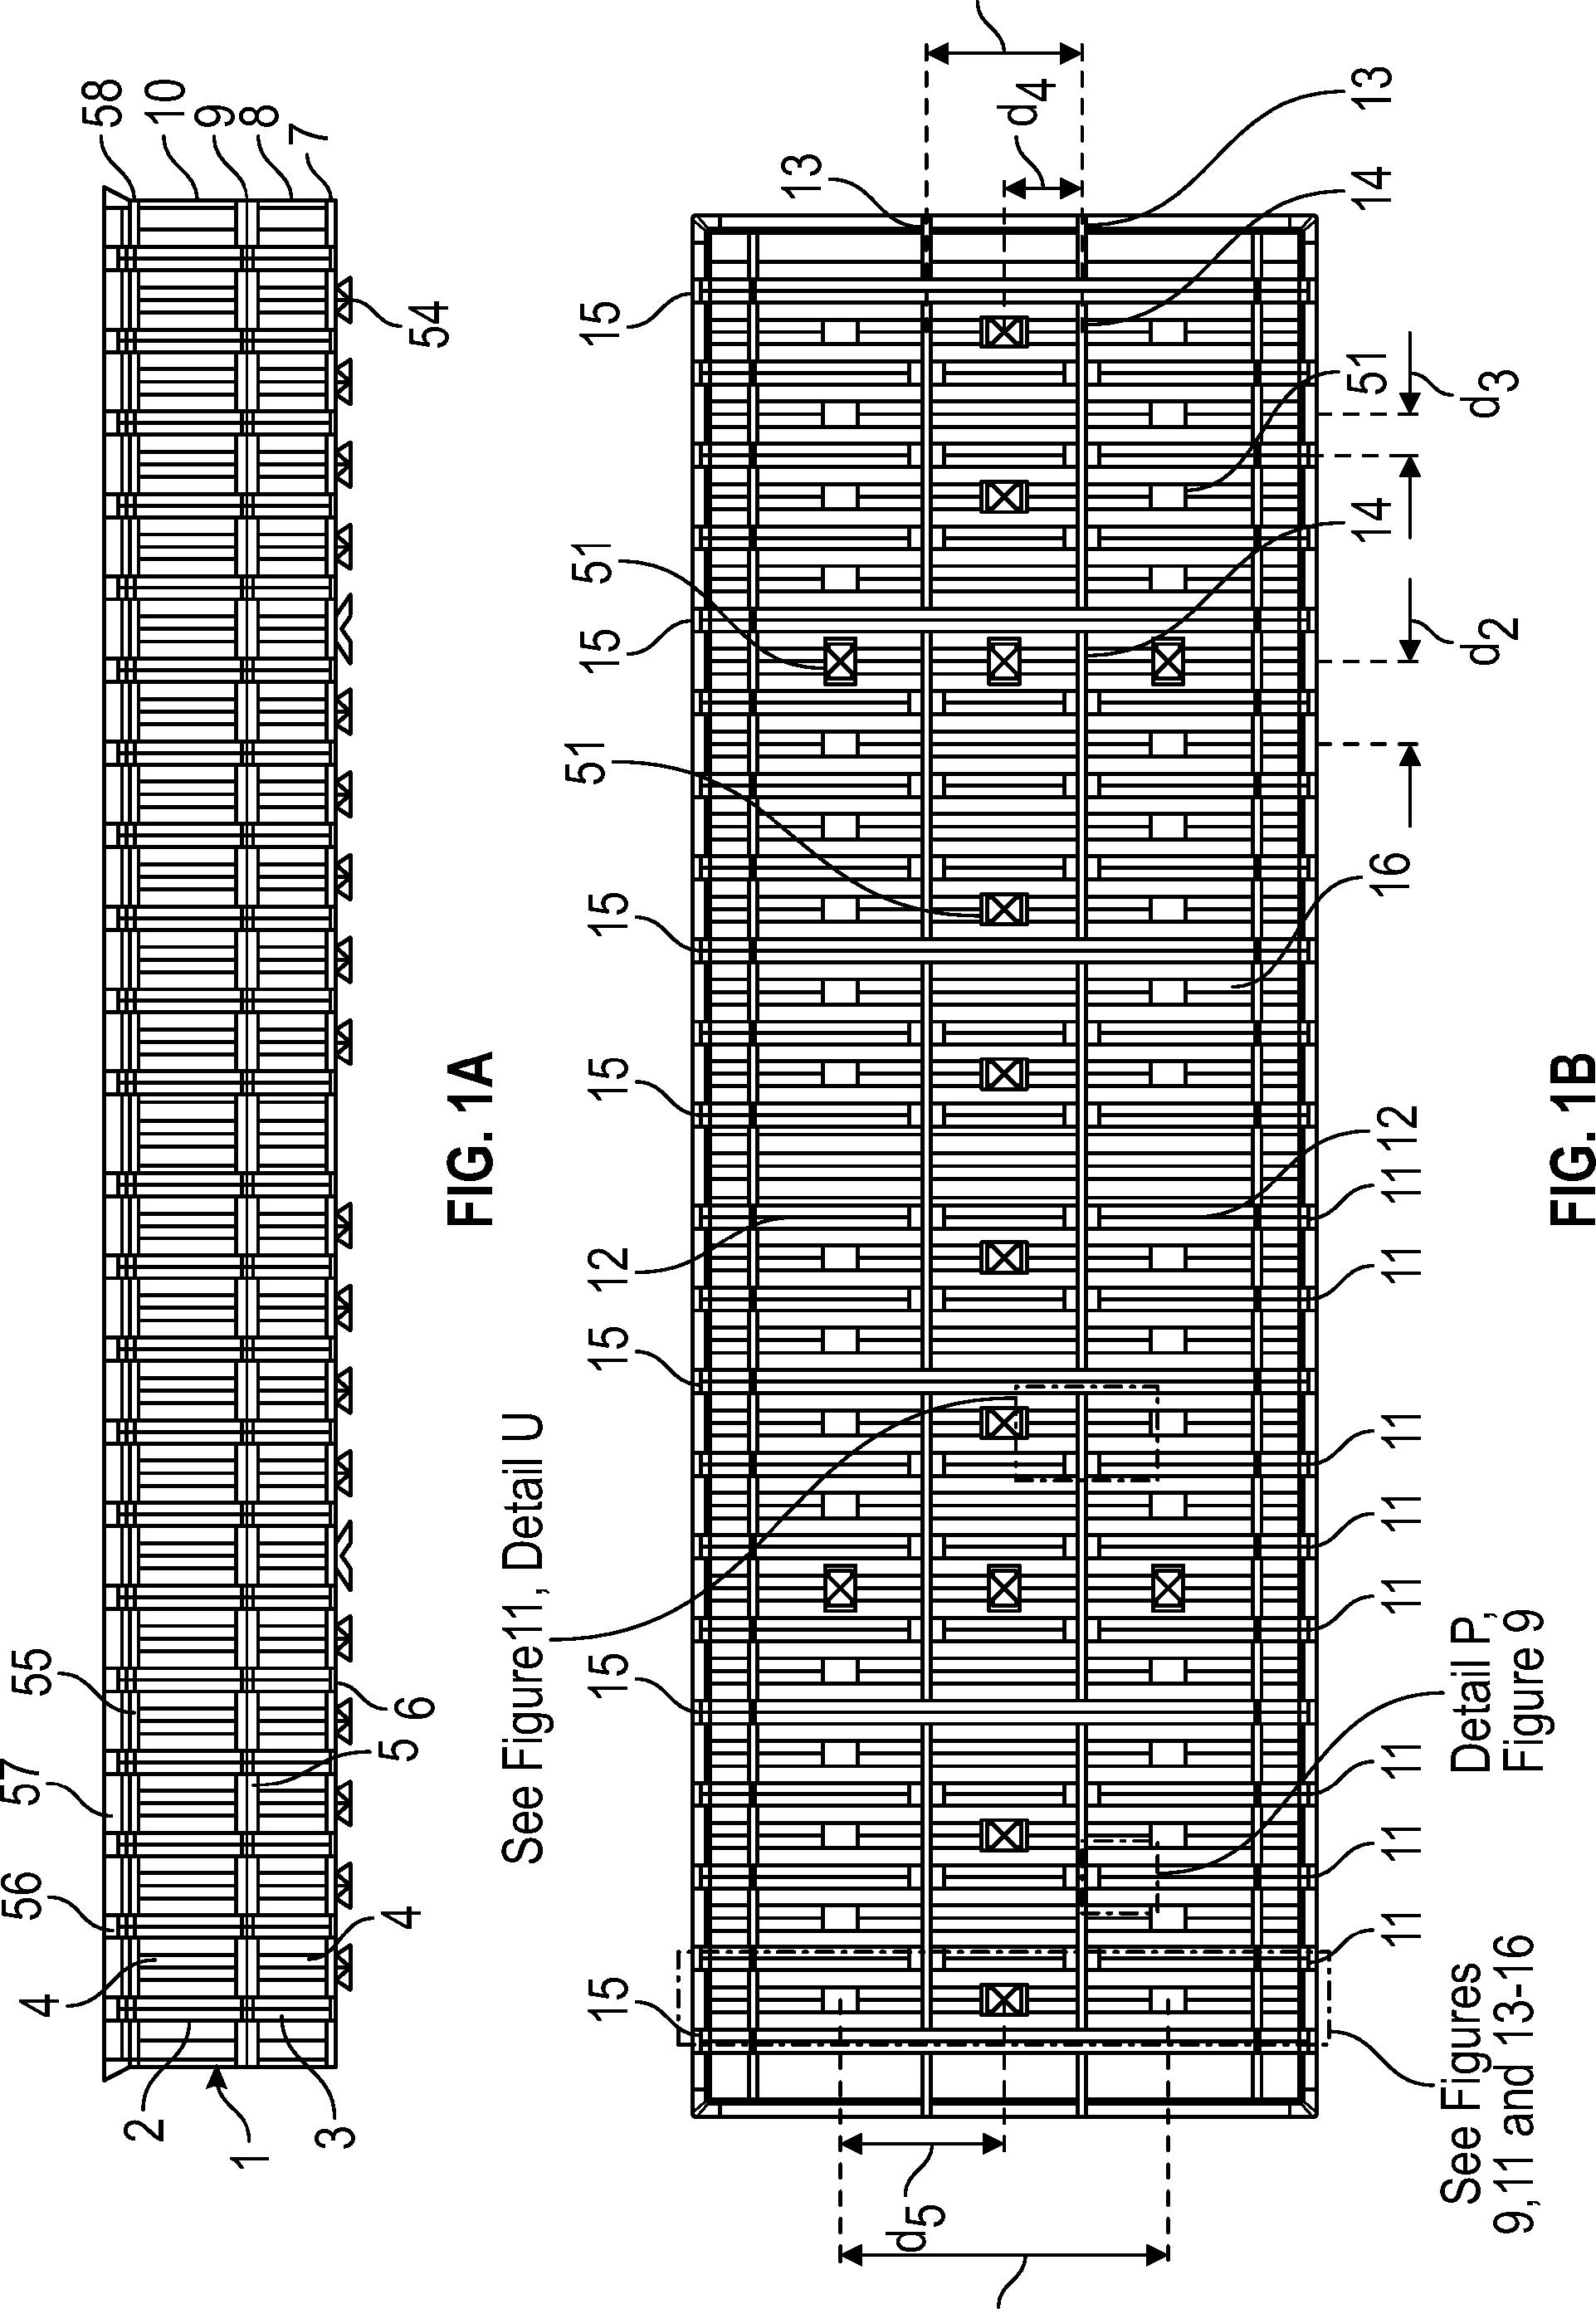 Figure GB2554862A_D0002